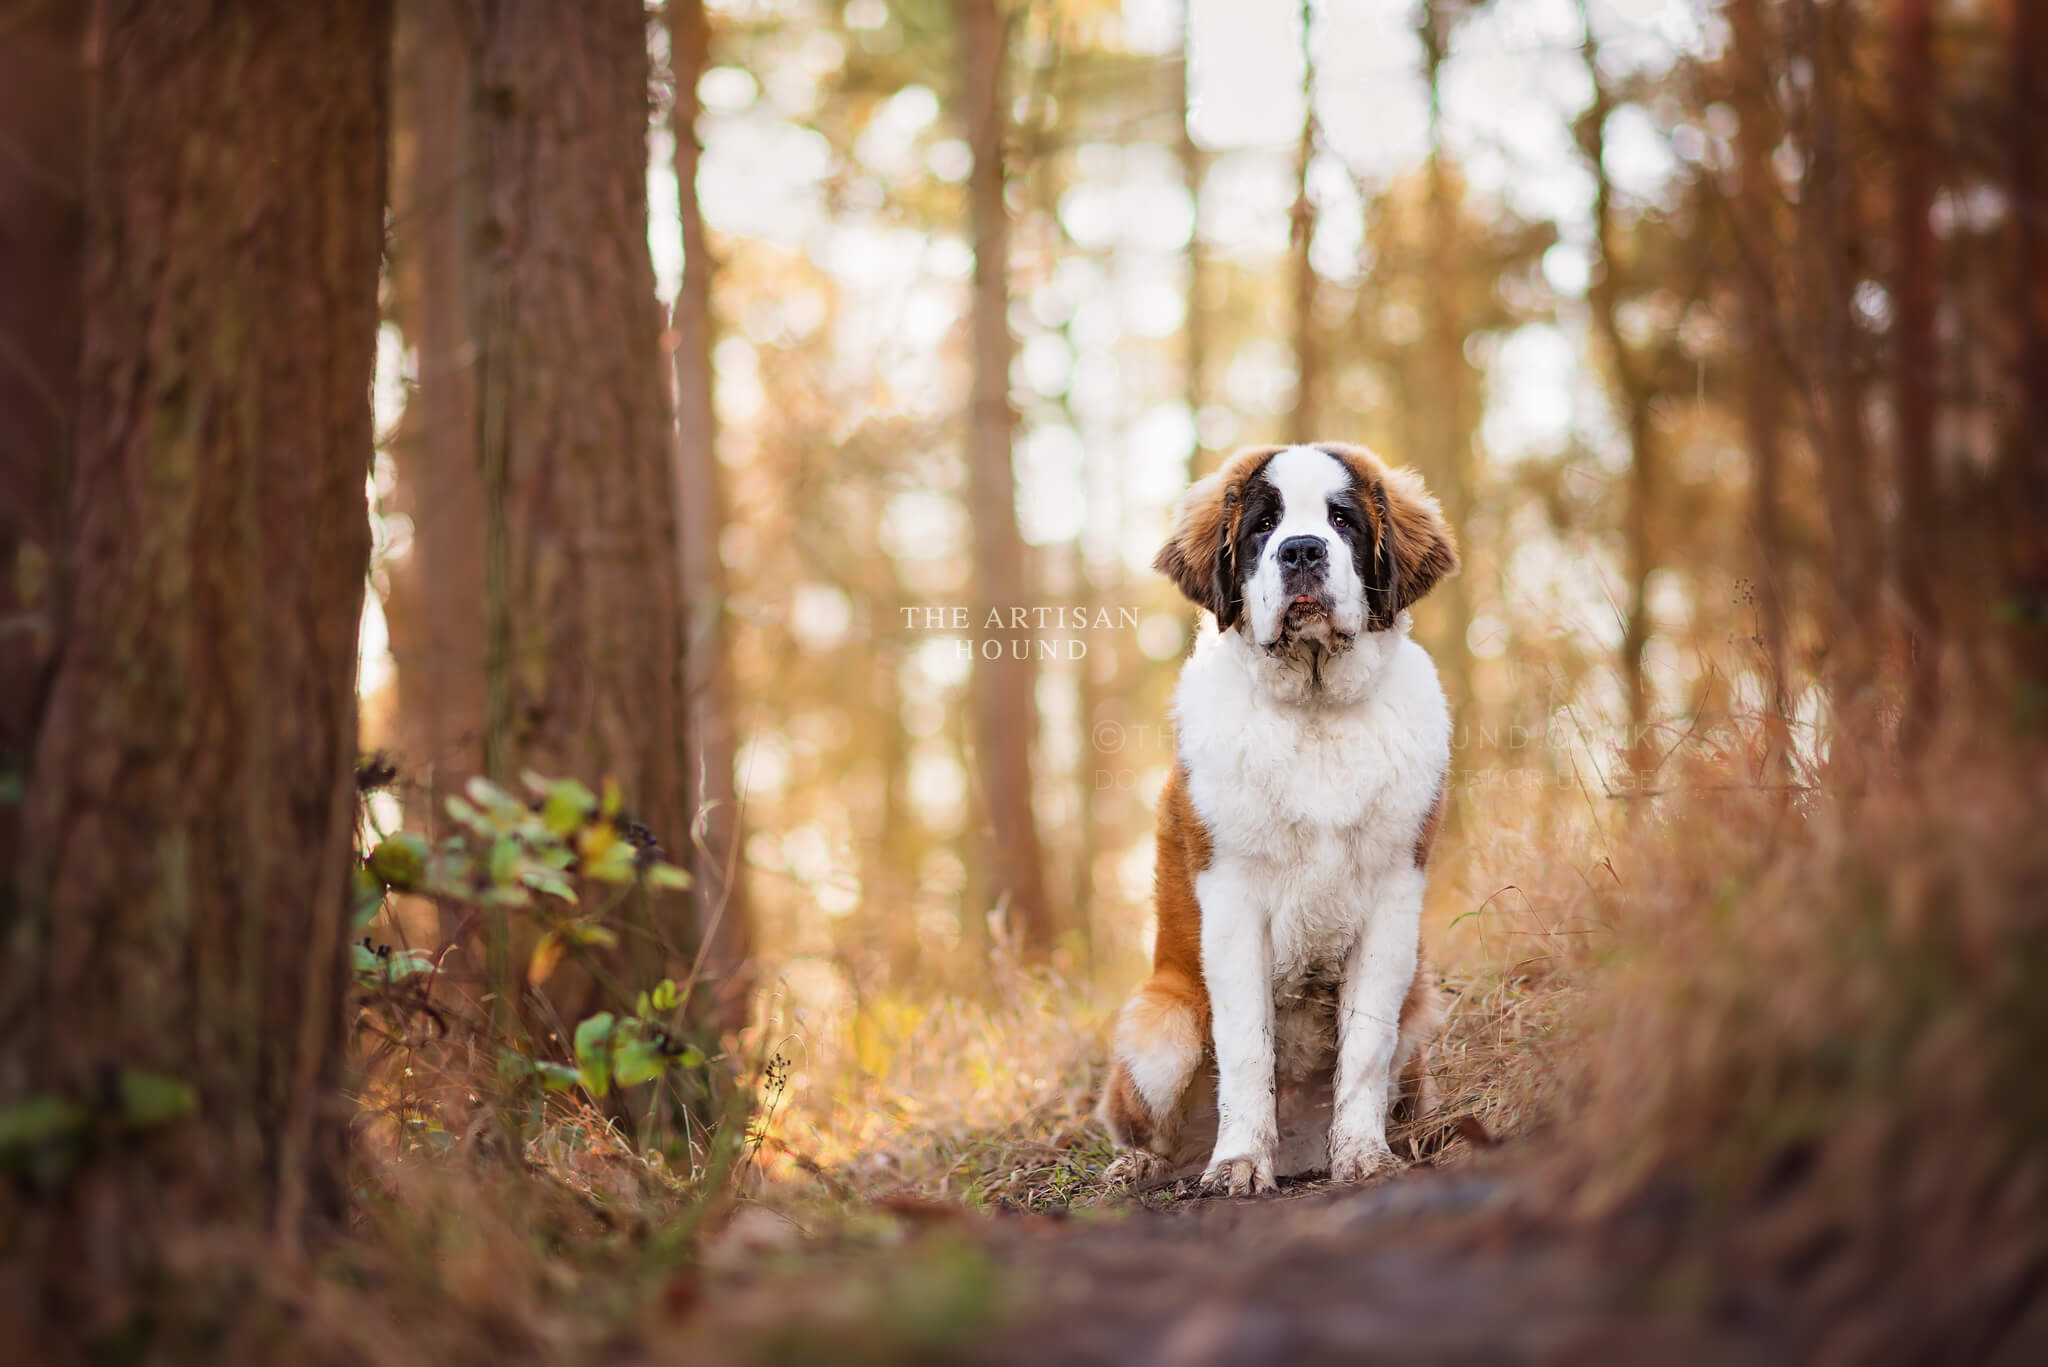 St Bernard dog sitting on path in Northamptonshire woodland